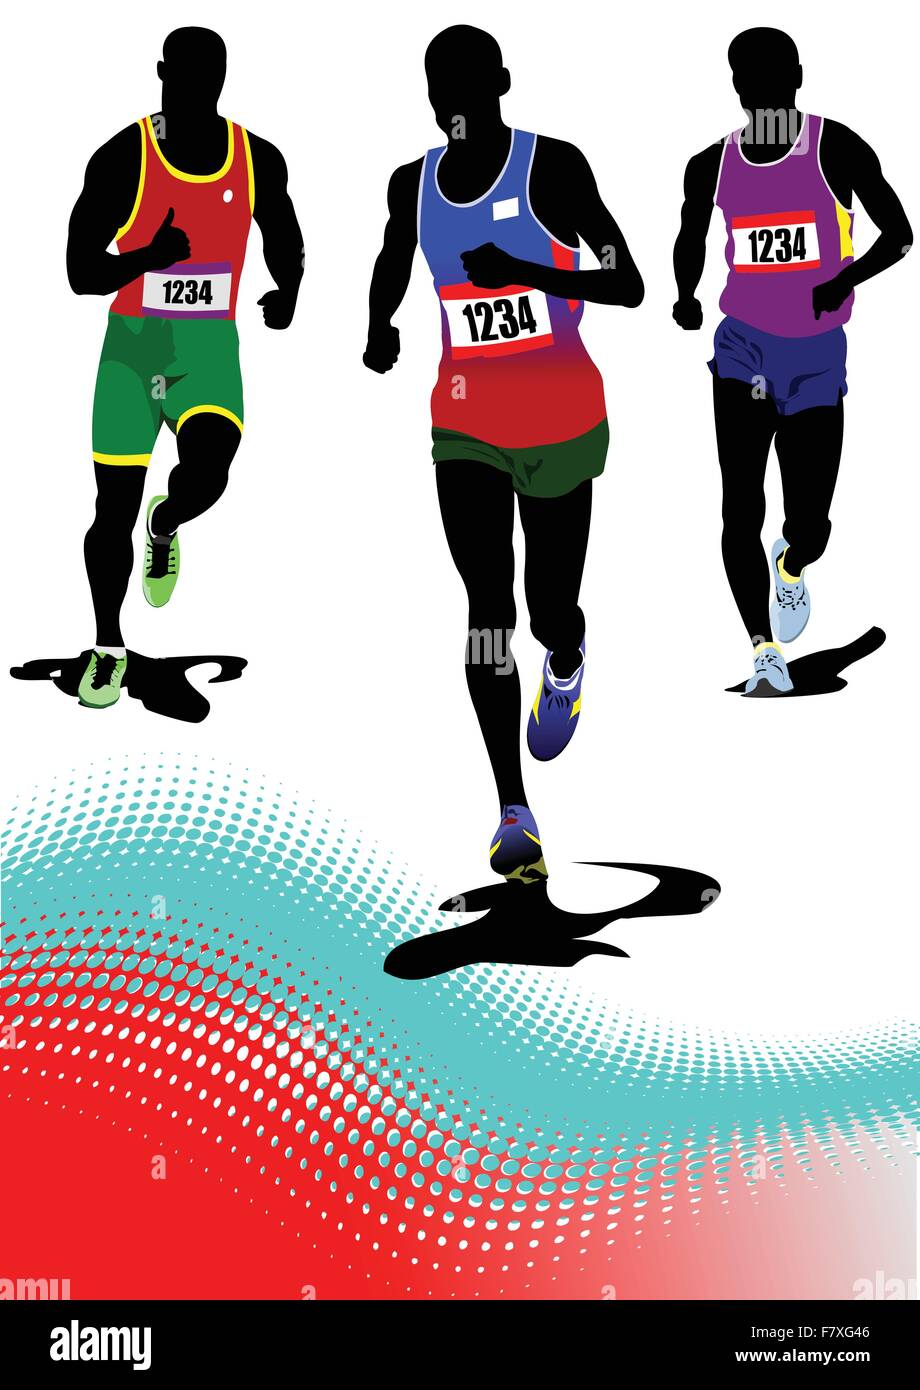 The running man. Track and field. Vector illustration - Stock Vector